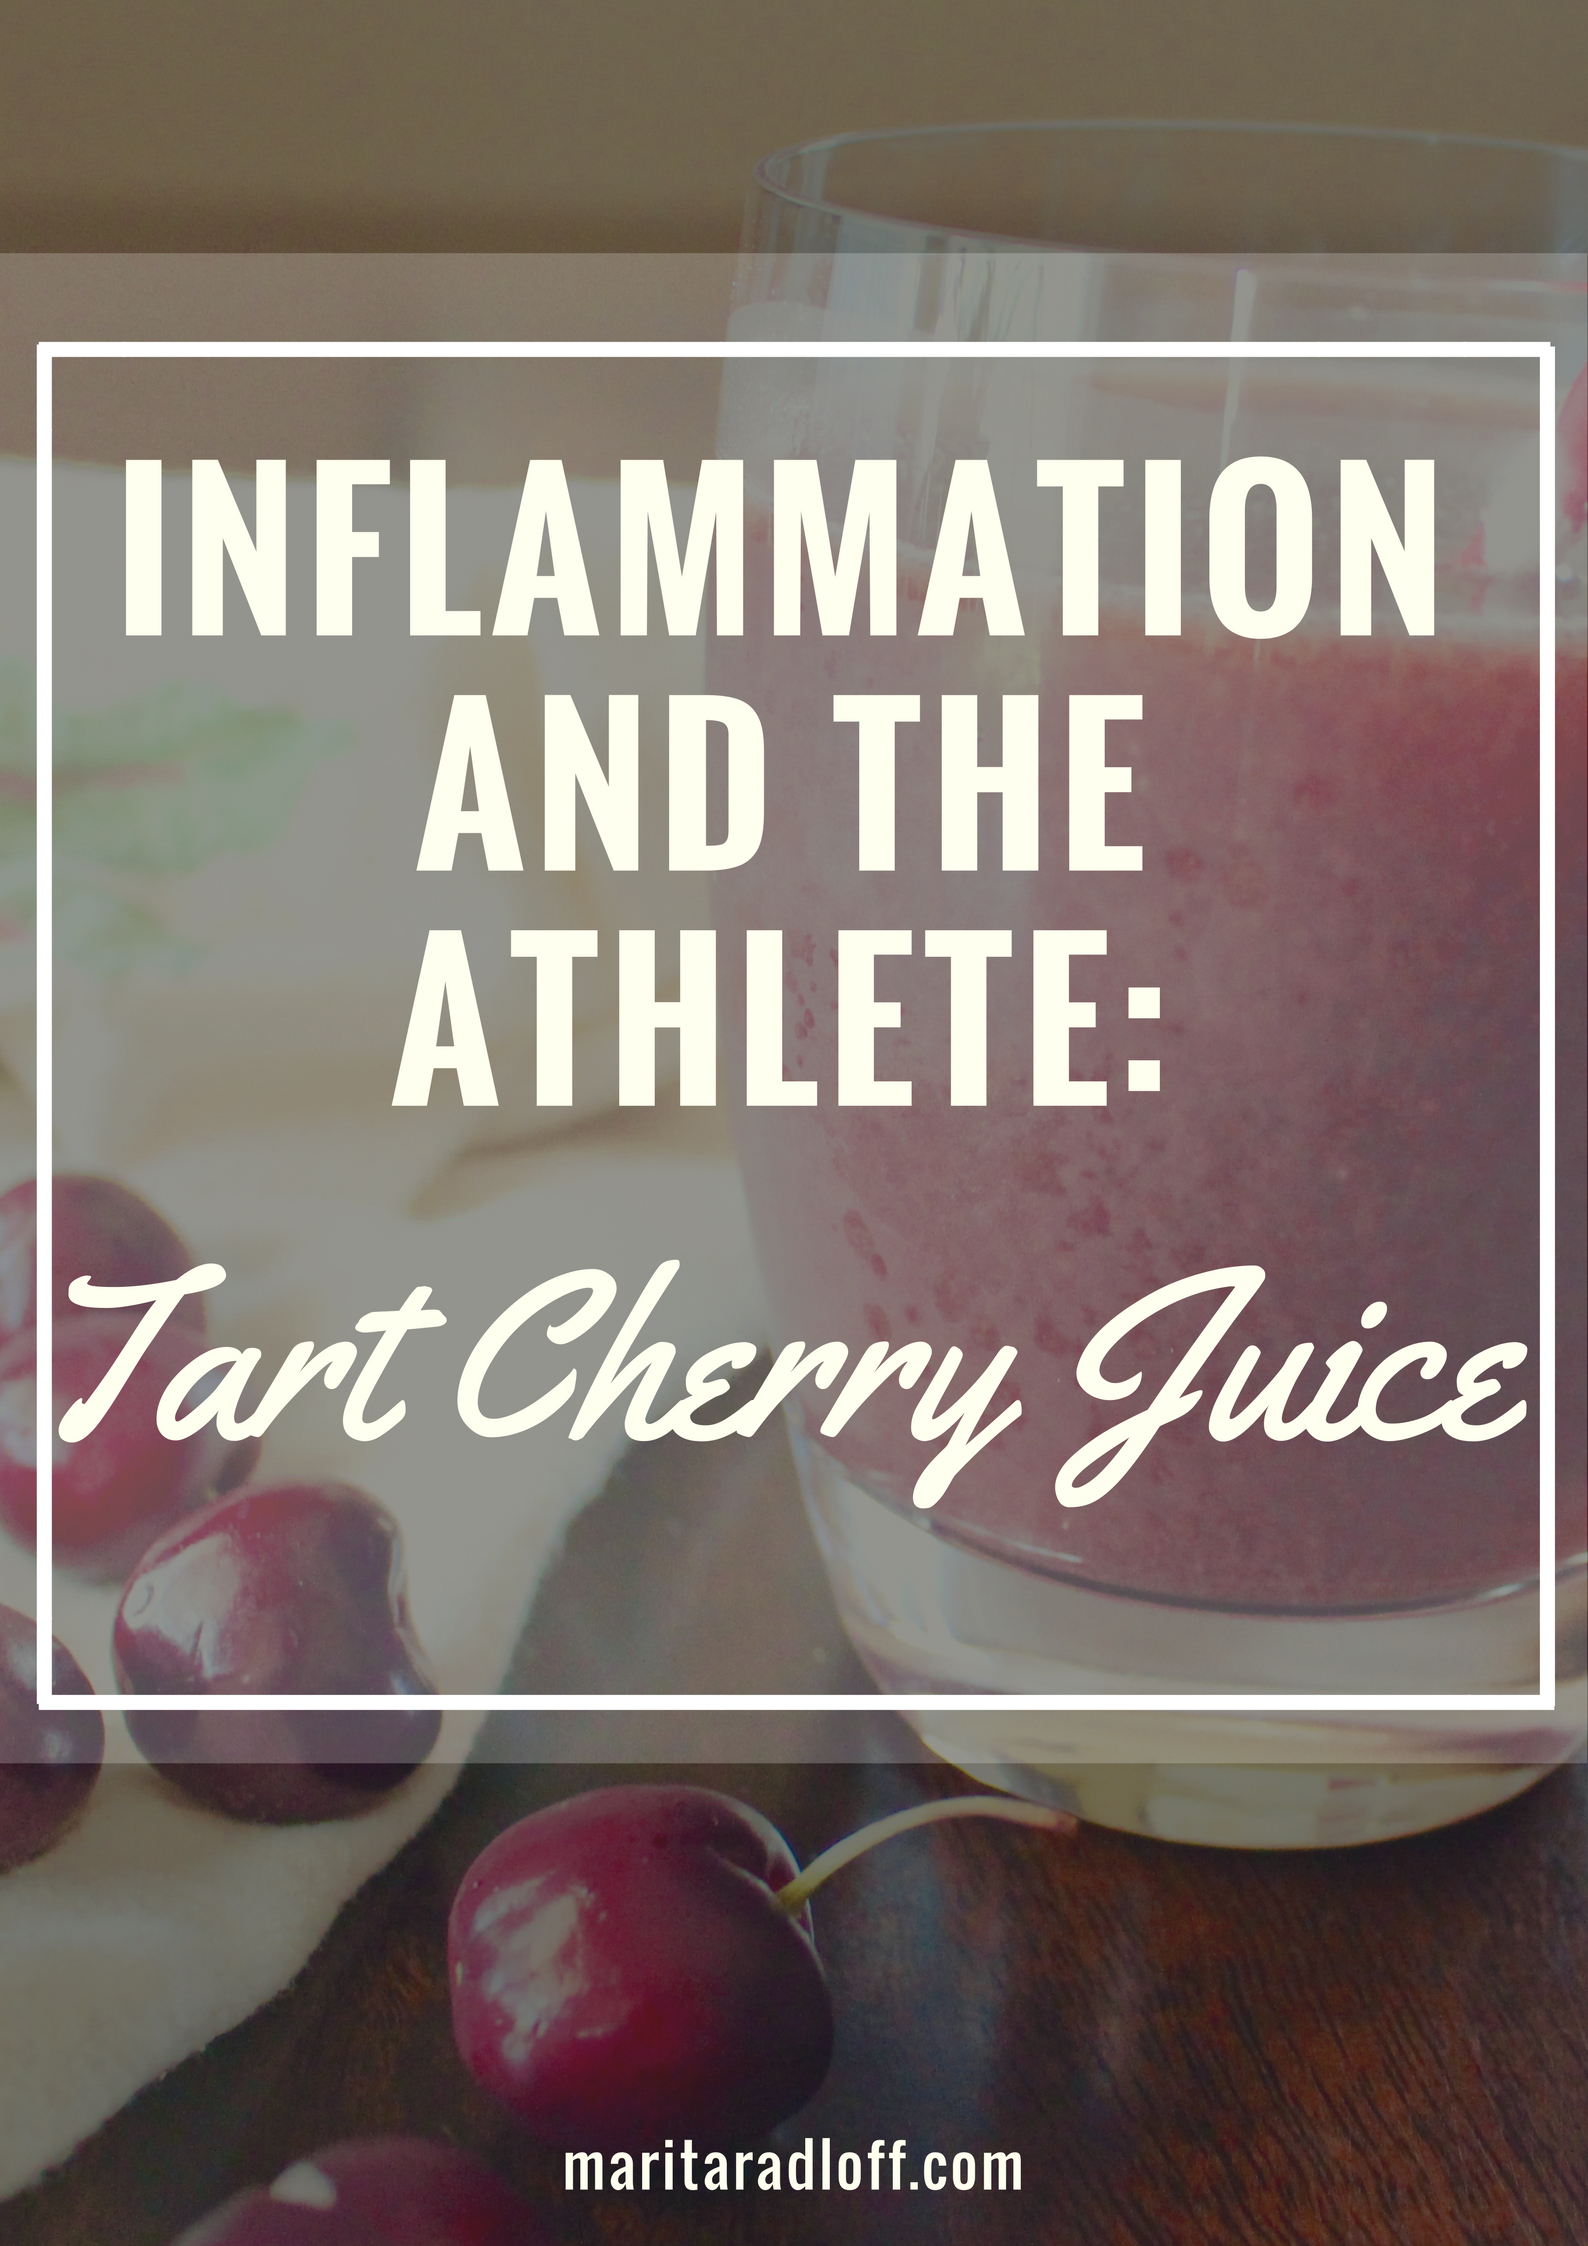 tart cherry juice for athletes.jpg